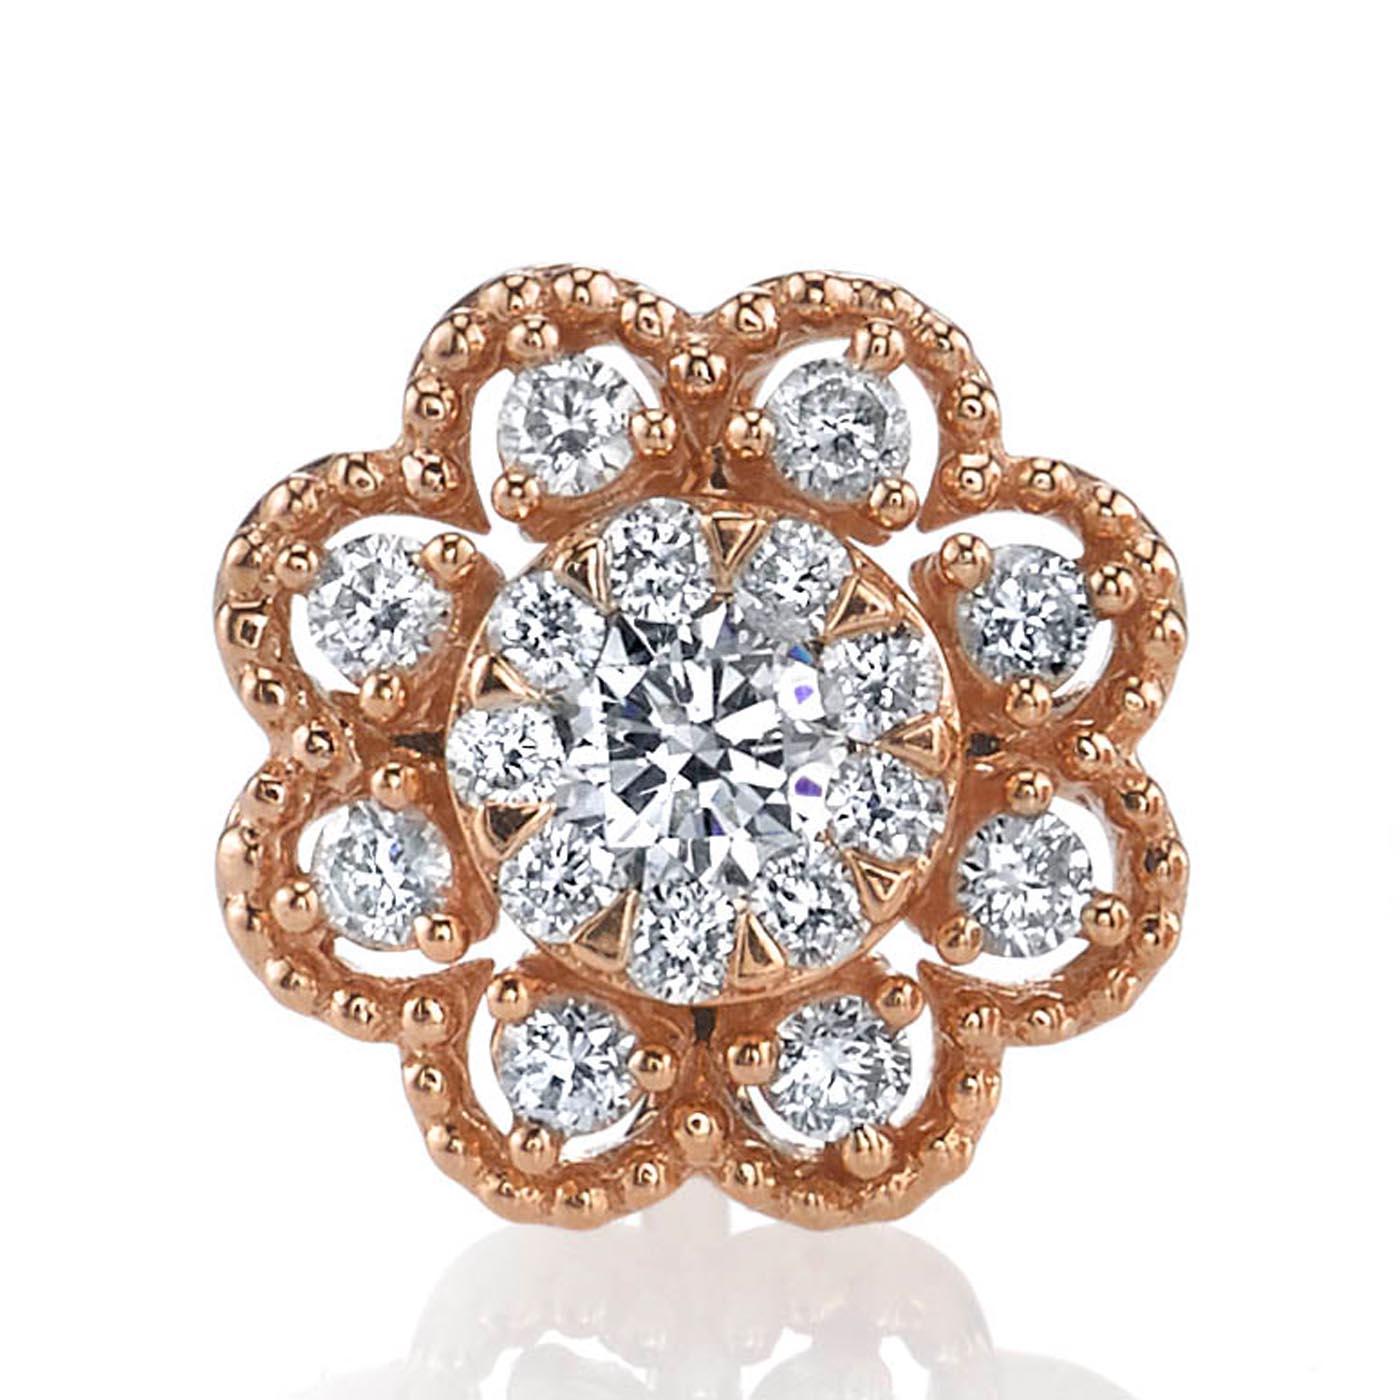 Diamond Earrings - Studs Style #: MARS-26897